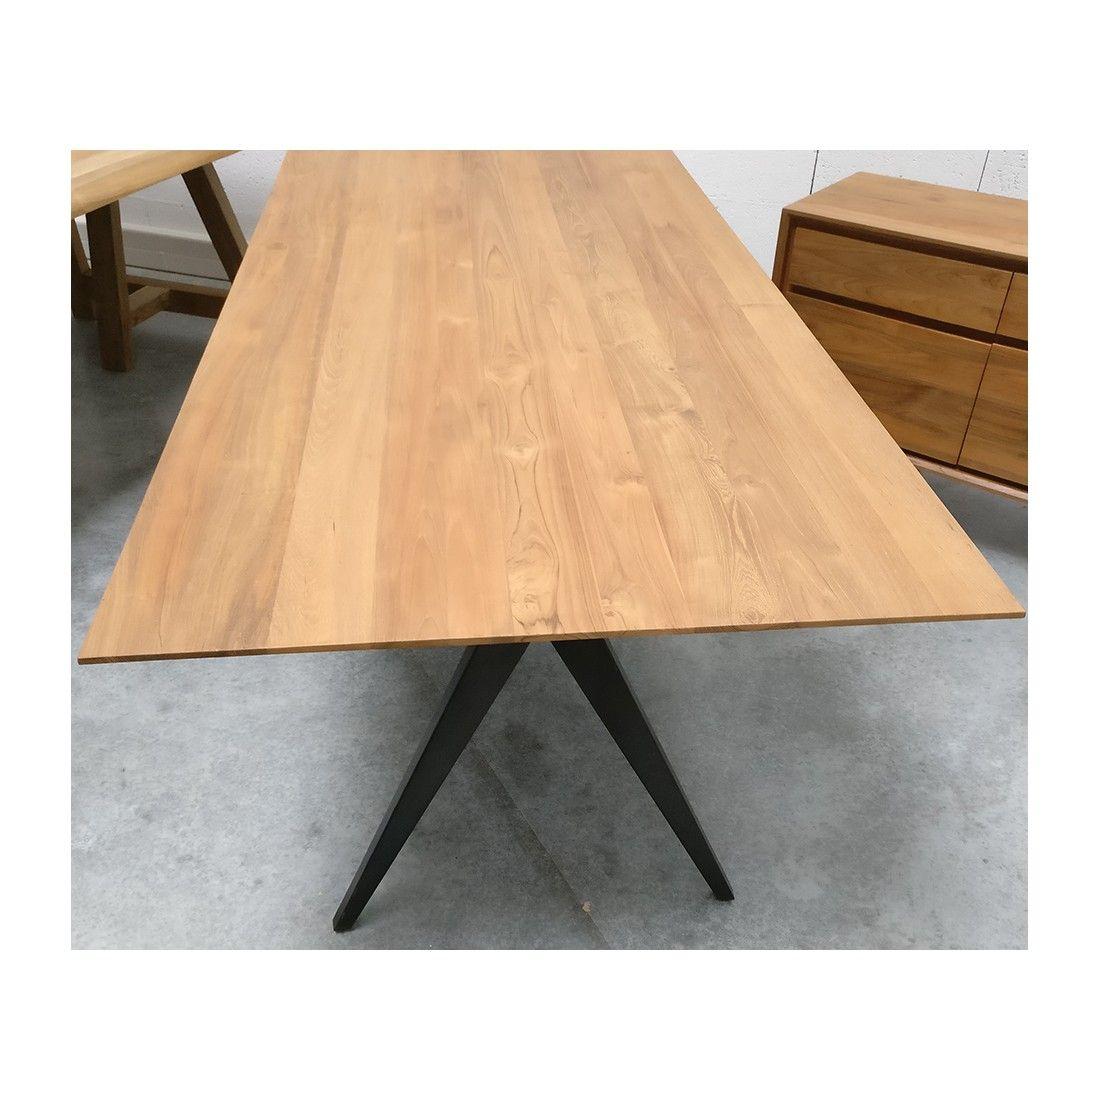 Table en teck massif 240x100 cm, majestueuse